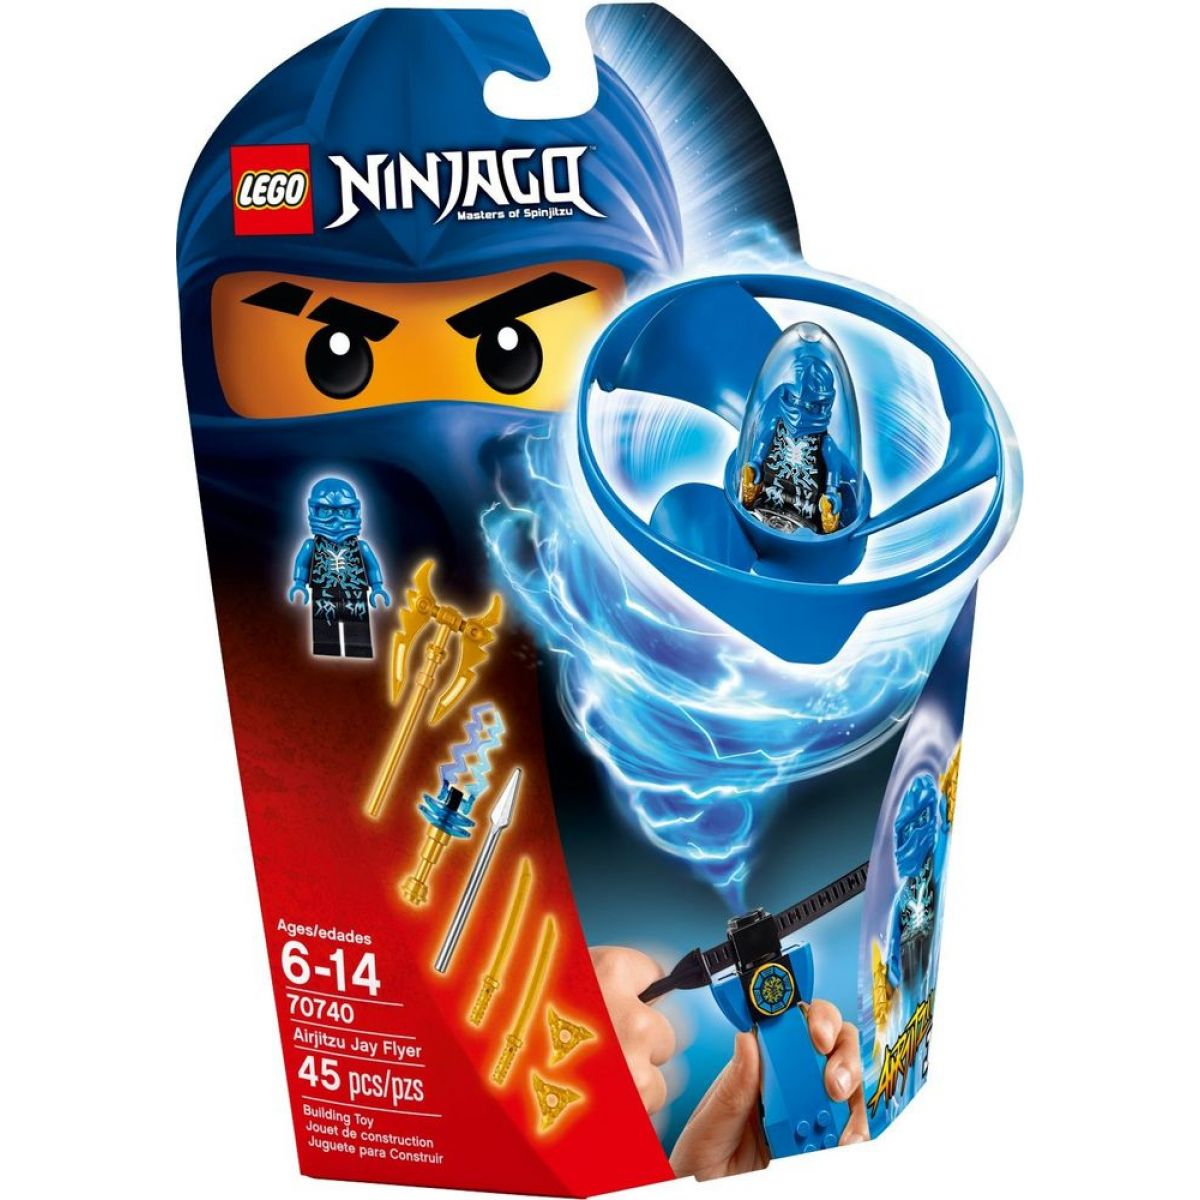 LEGO Ninjago 70740 Jayův letoun Airjitzu - Poškozený obal